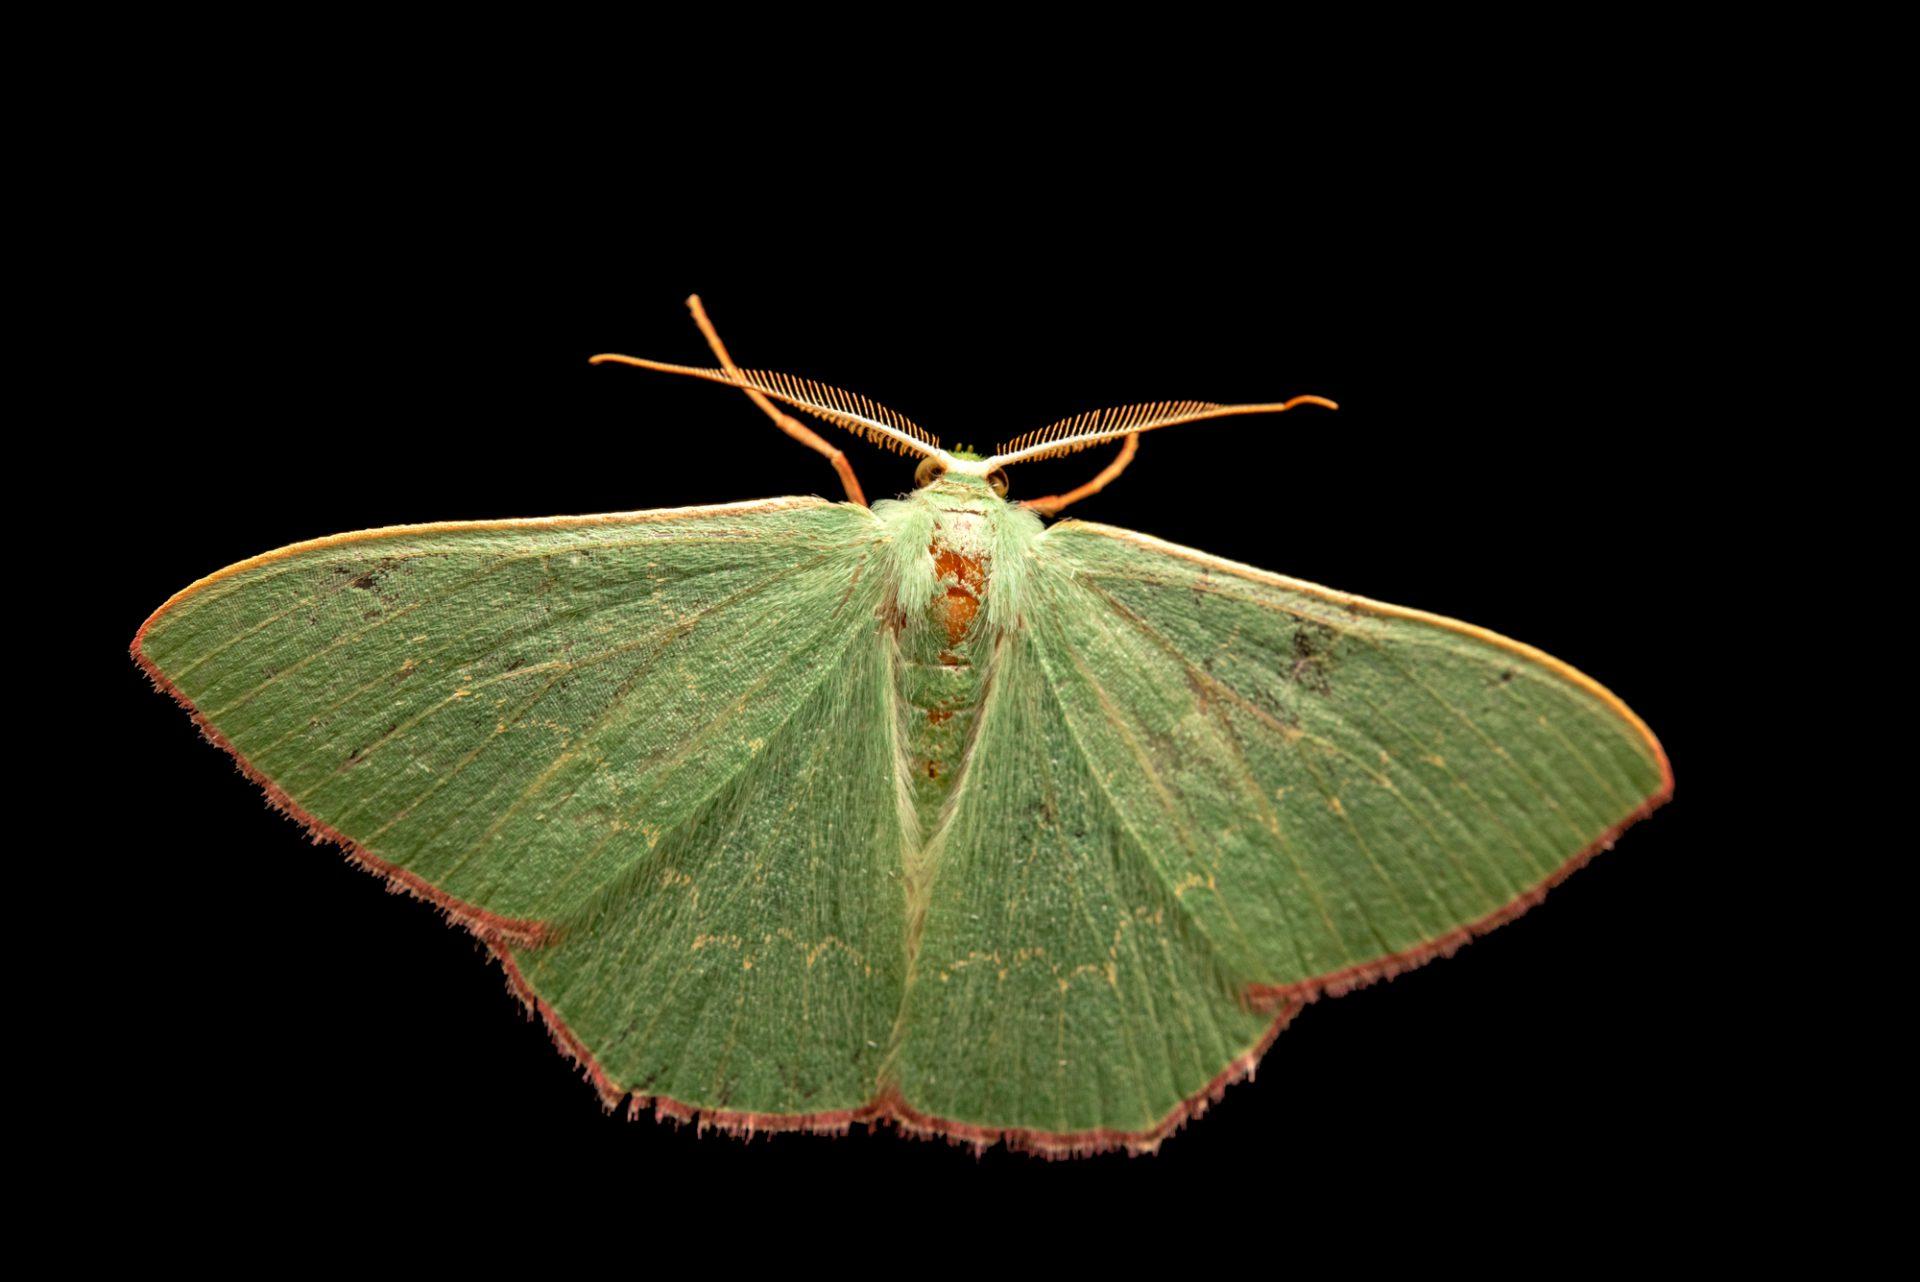 Photo: A male common gum emerald moth (Prasinocyma semicrocea) at Lilydale High School in Australia.